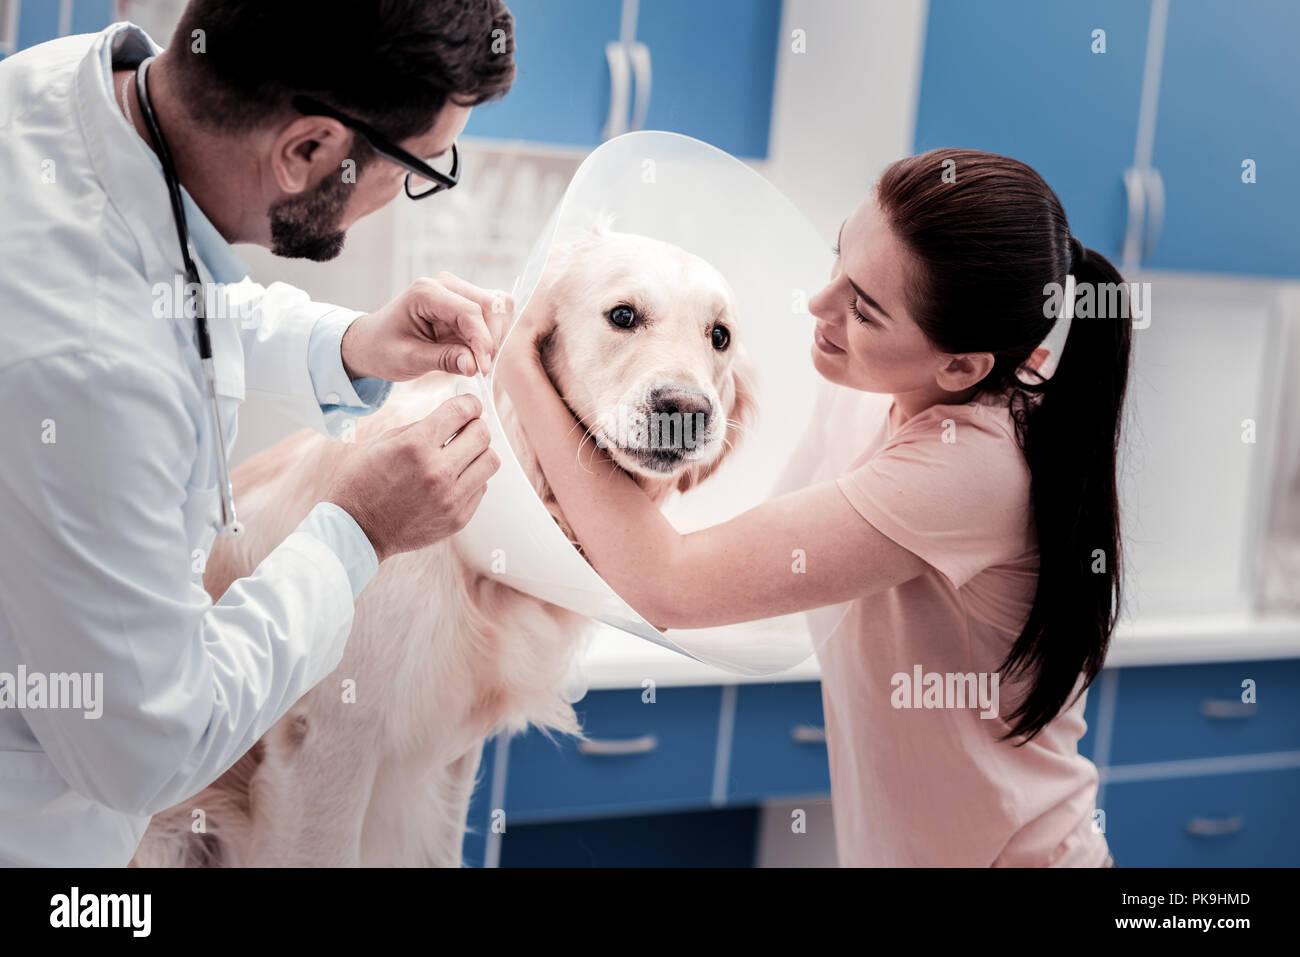 Encantadora chica abrazando a su mascota Imagen De Stock